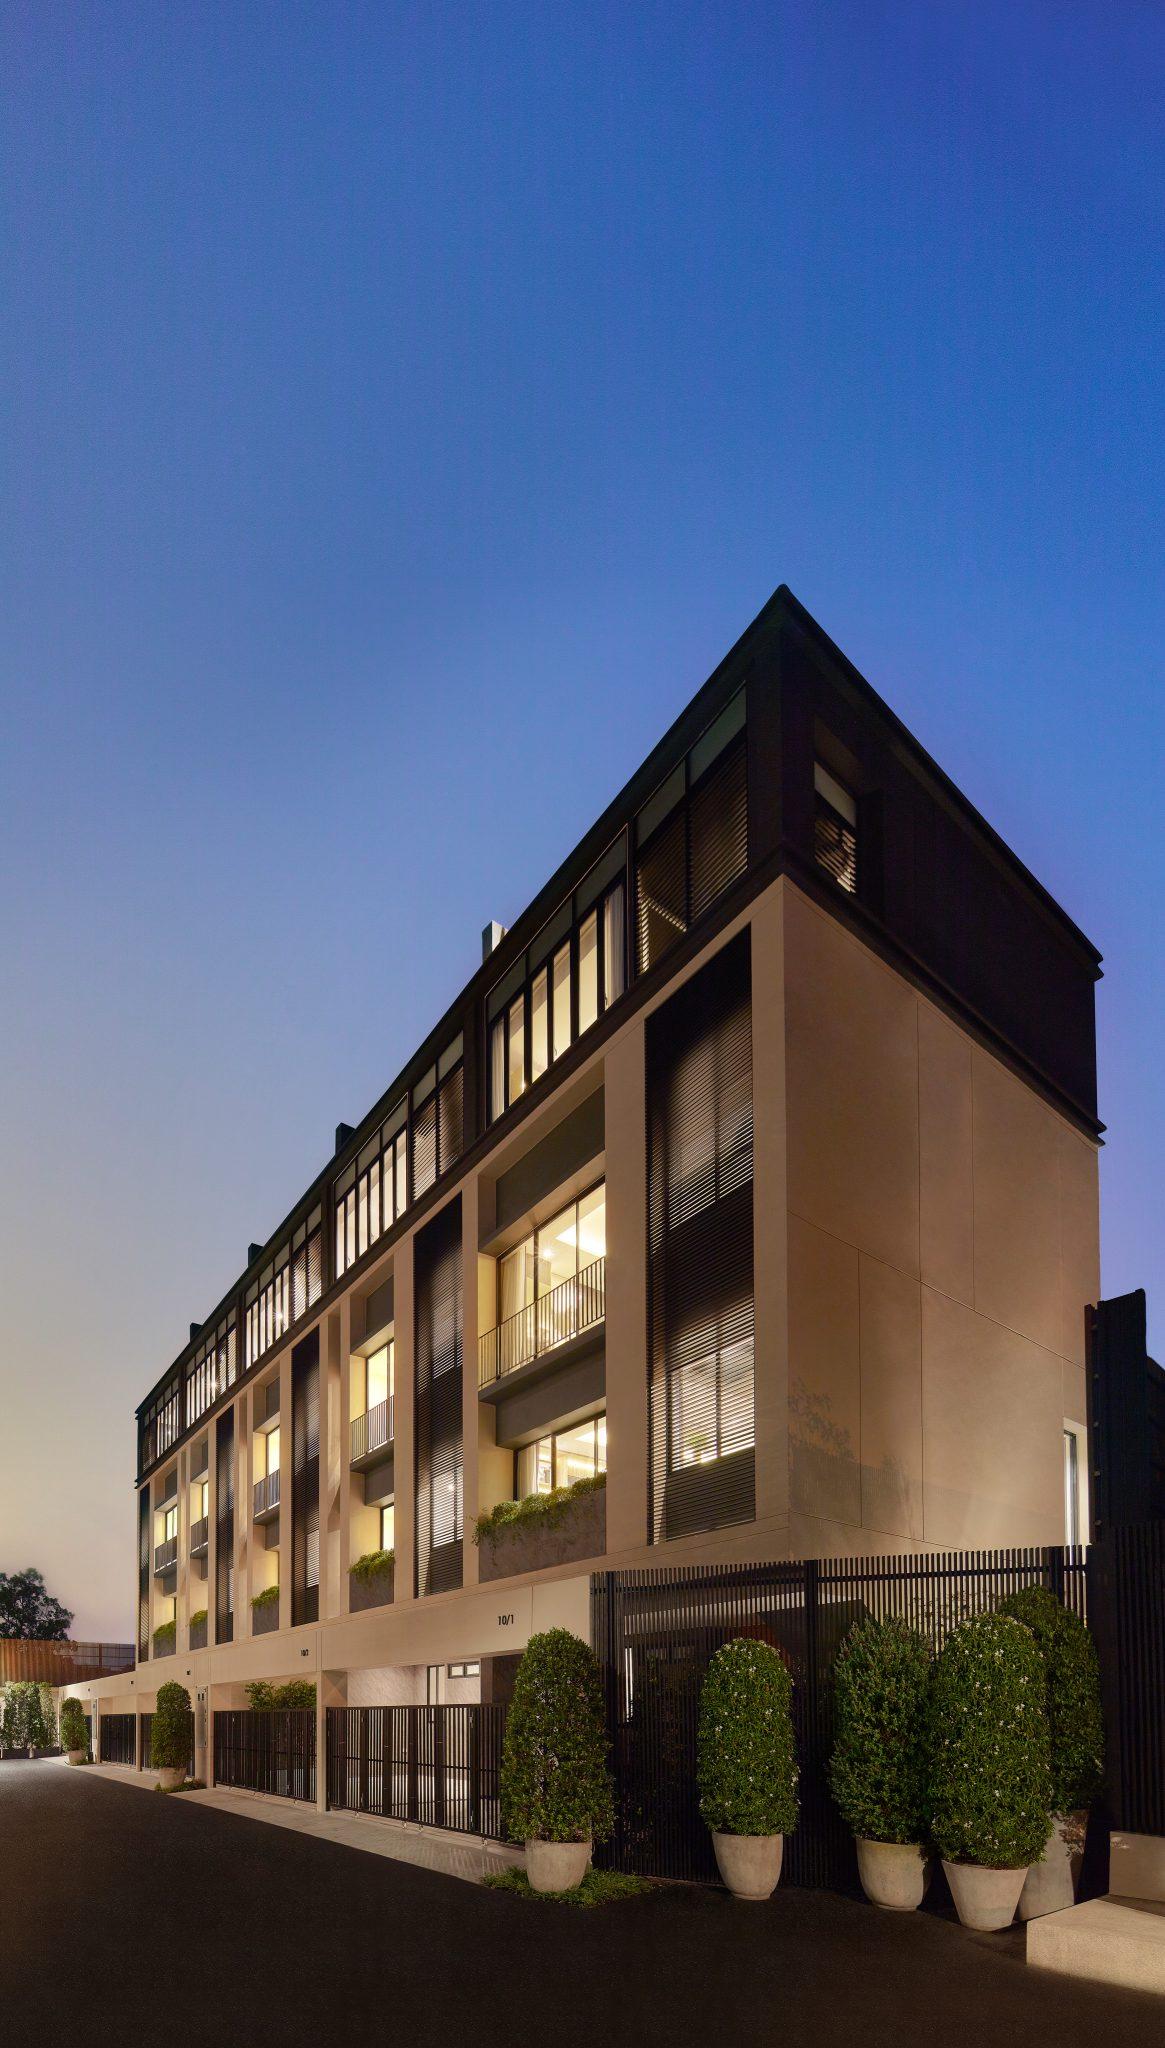 AIRES RAMA9 รีวิว Luxury Townhome 3.5 ชั้น + Rooftop ออกแบบสวย ย่านพระราม9 (ใกล้ รพ.สมิติเวช) 16 - AIRES